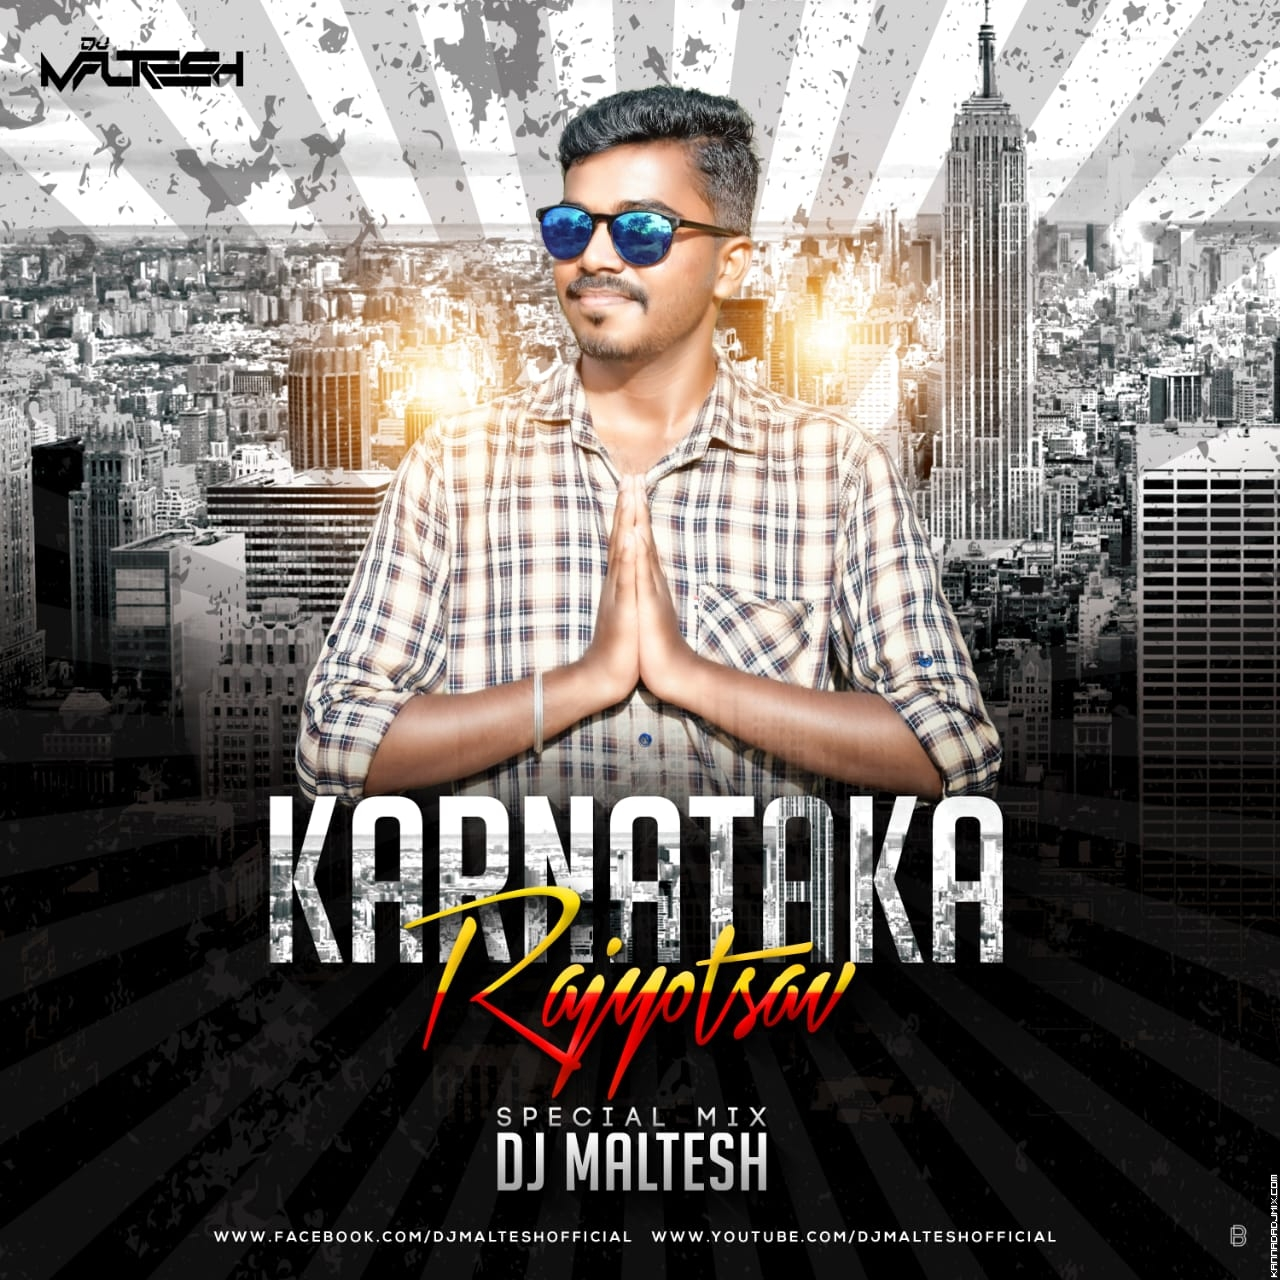 KARNATAKA RAJYOSTAV TRANCE MIX DJ MALTESH OFFICIAL.mp3